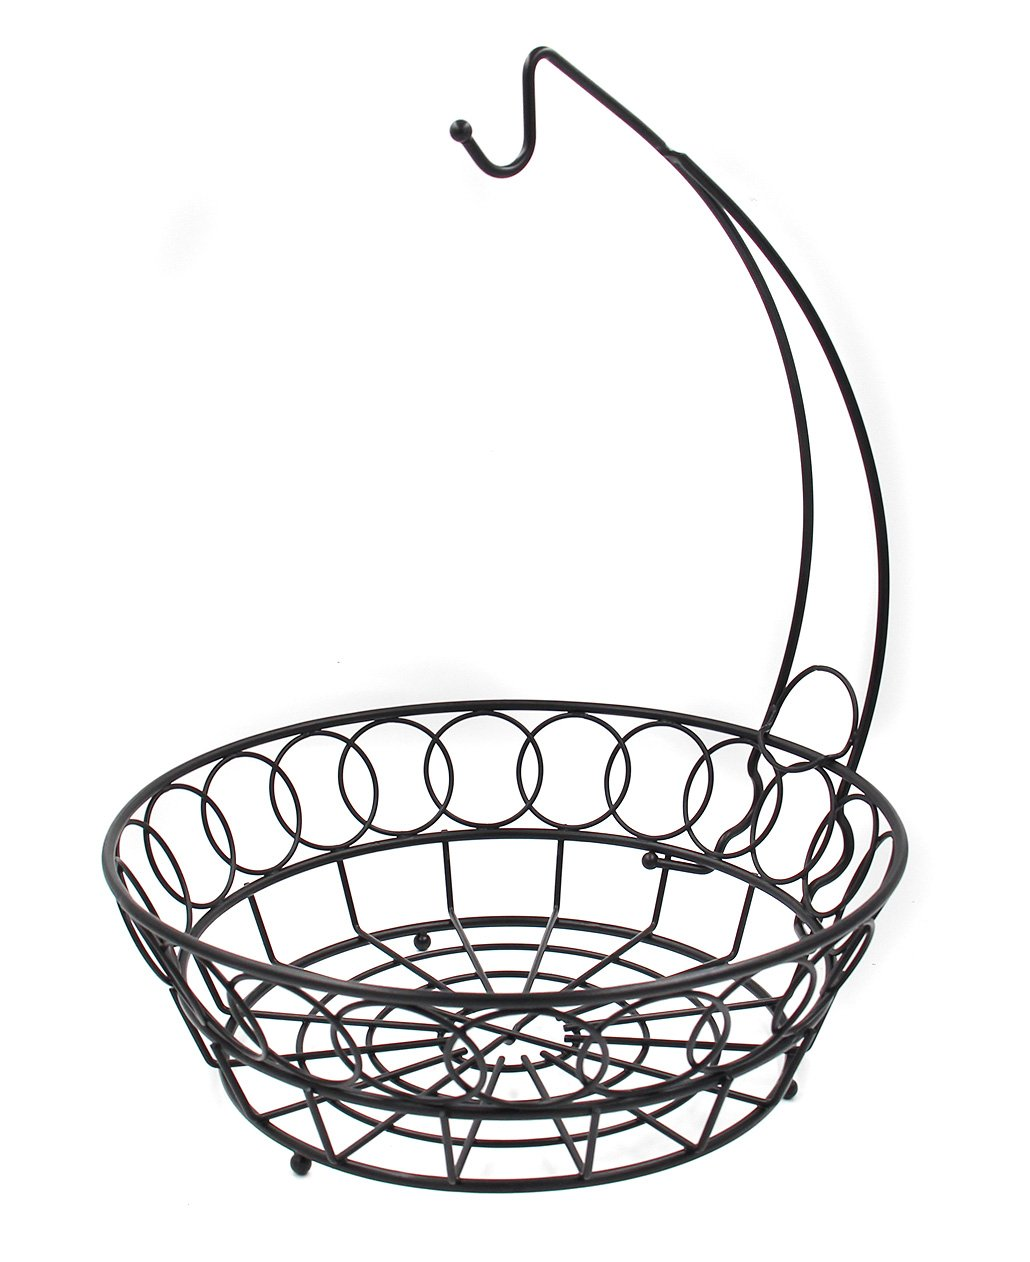 1030x1262 Esylife Fruit Basket With Banana Hook Metal Fruit Bowl Display